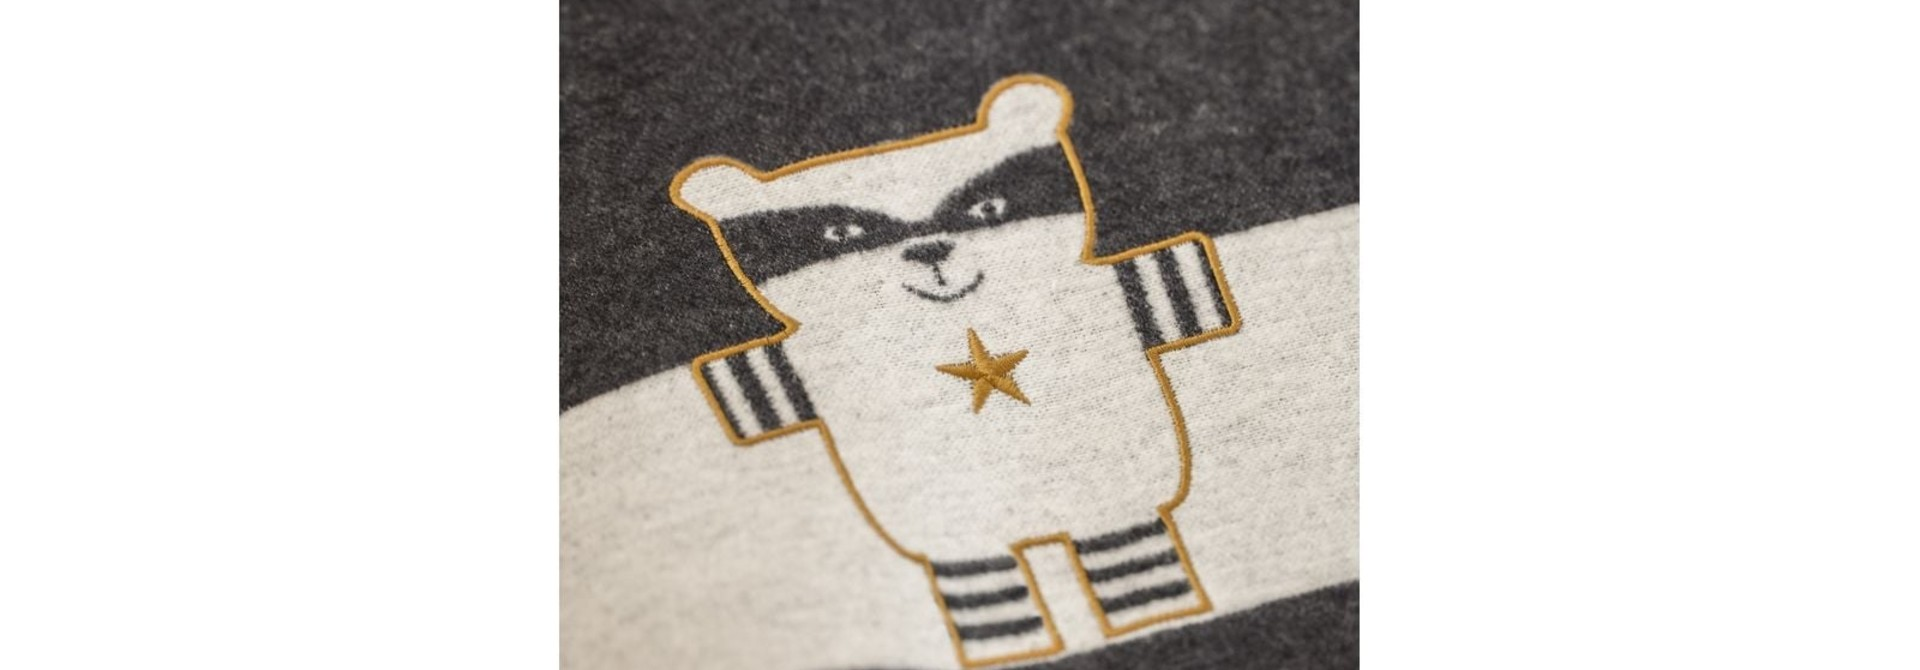 Blanket - Racoon - Charcoal Stripe